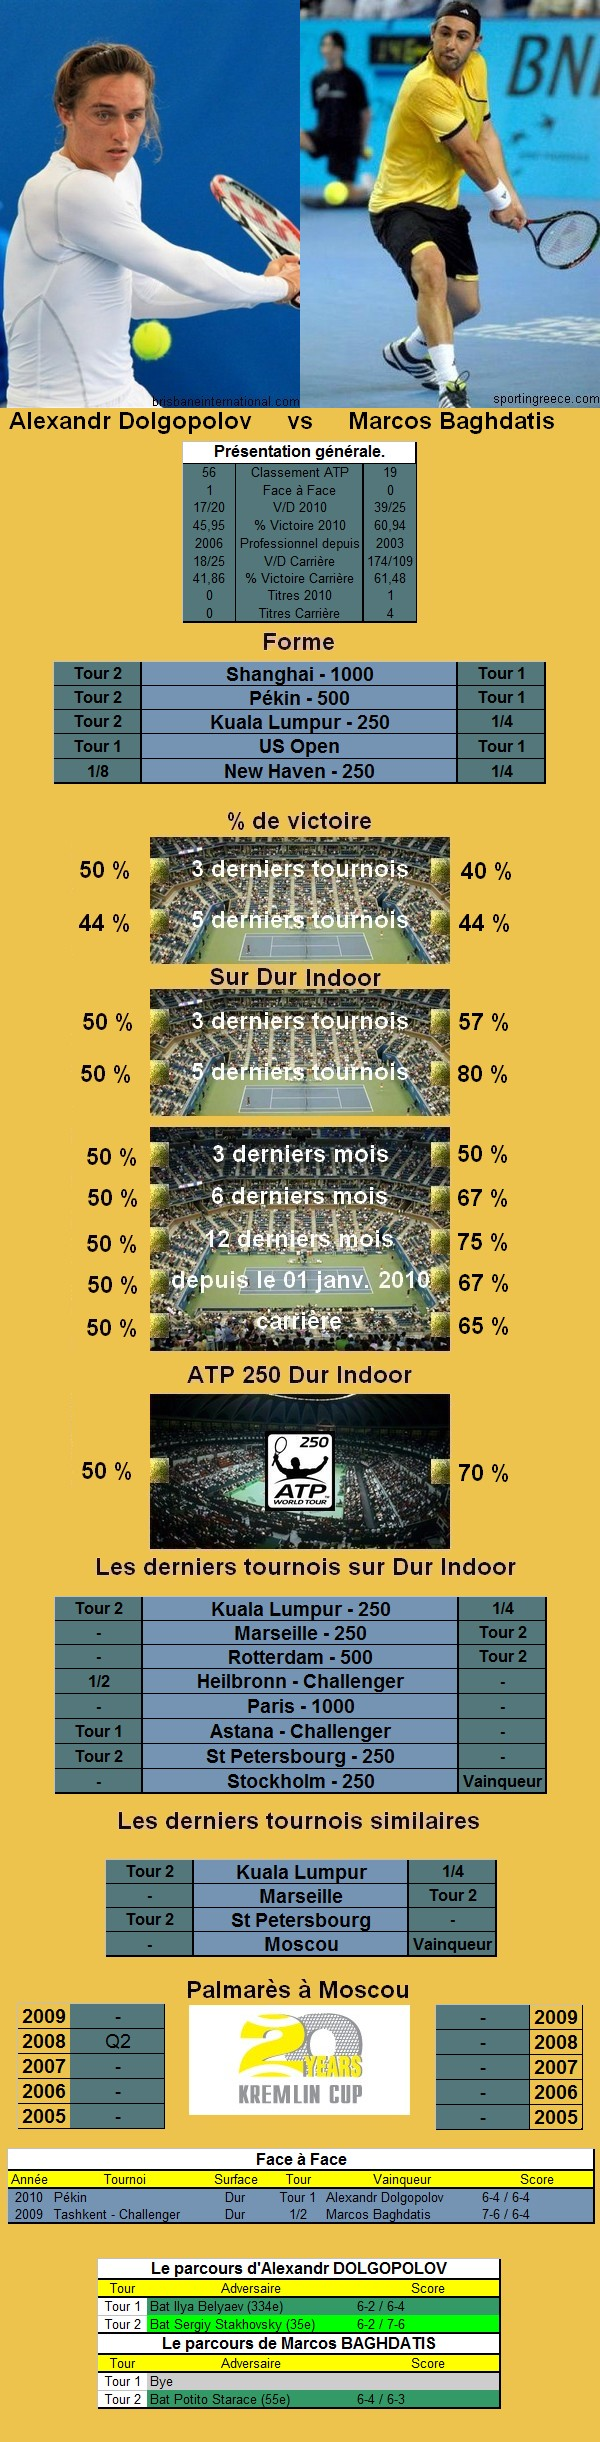 Statistiques tennis de Dolgopolov contre Baghdatis à Moscou